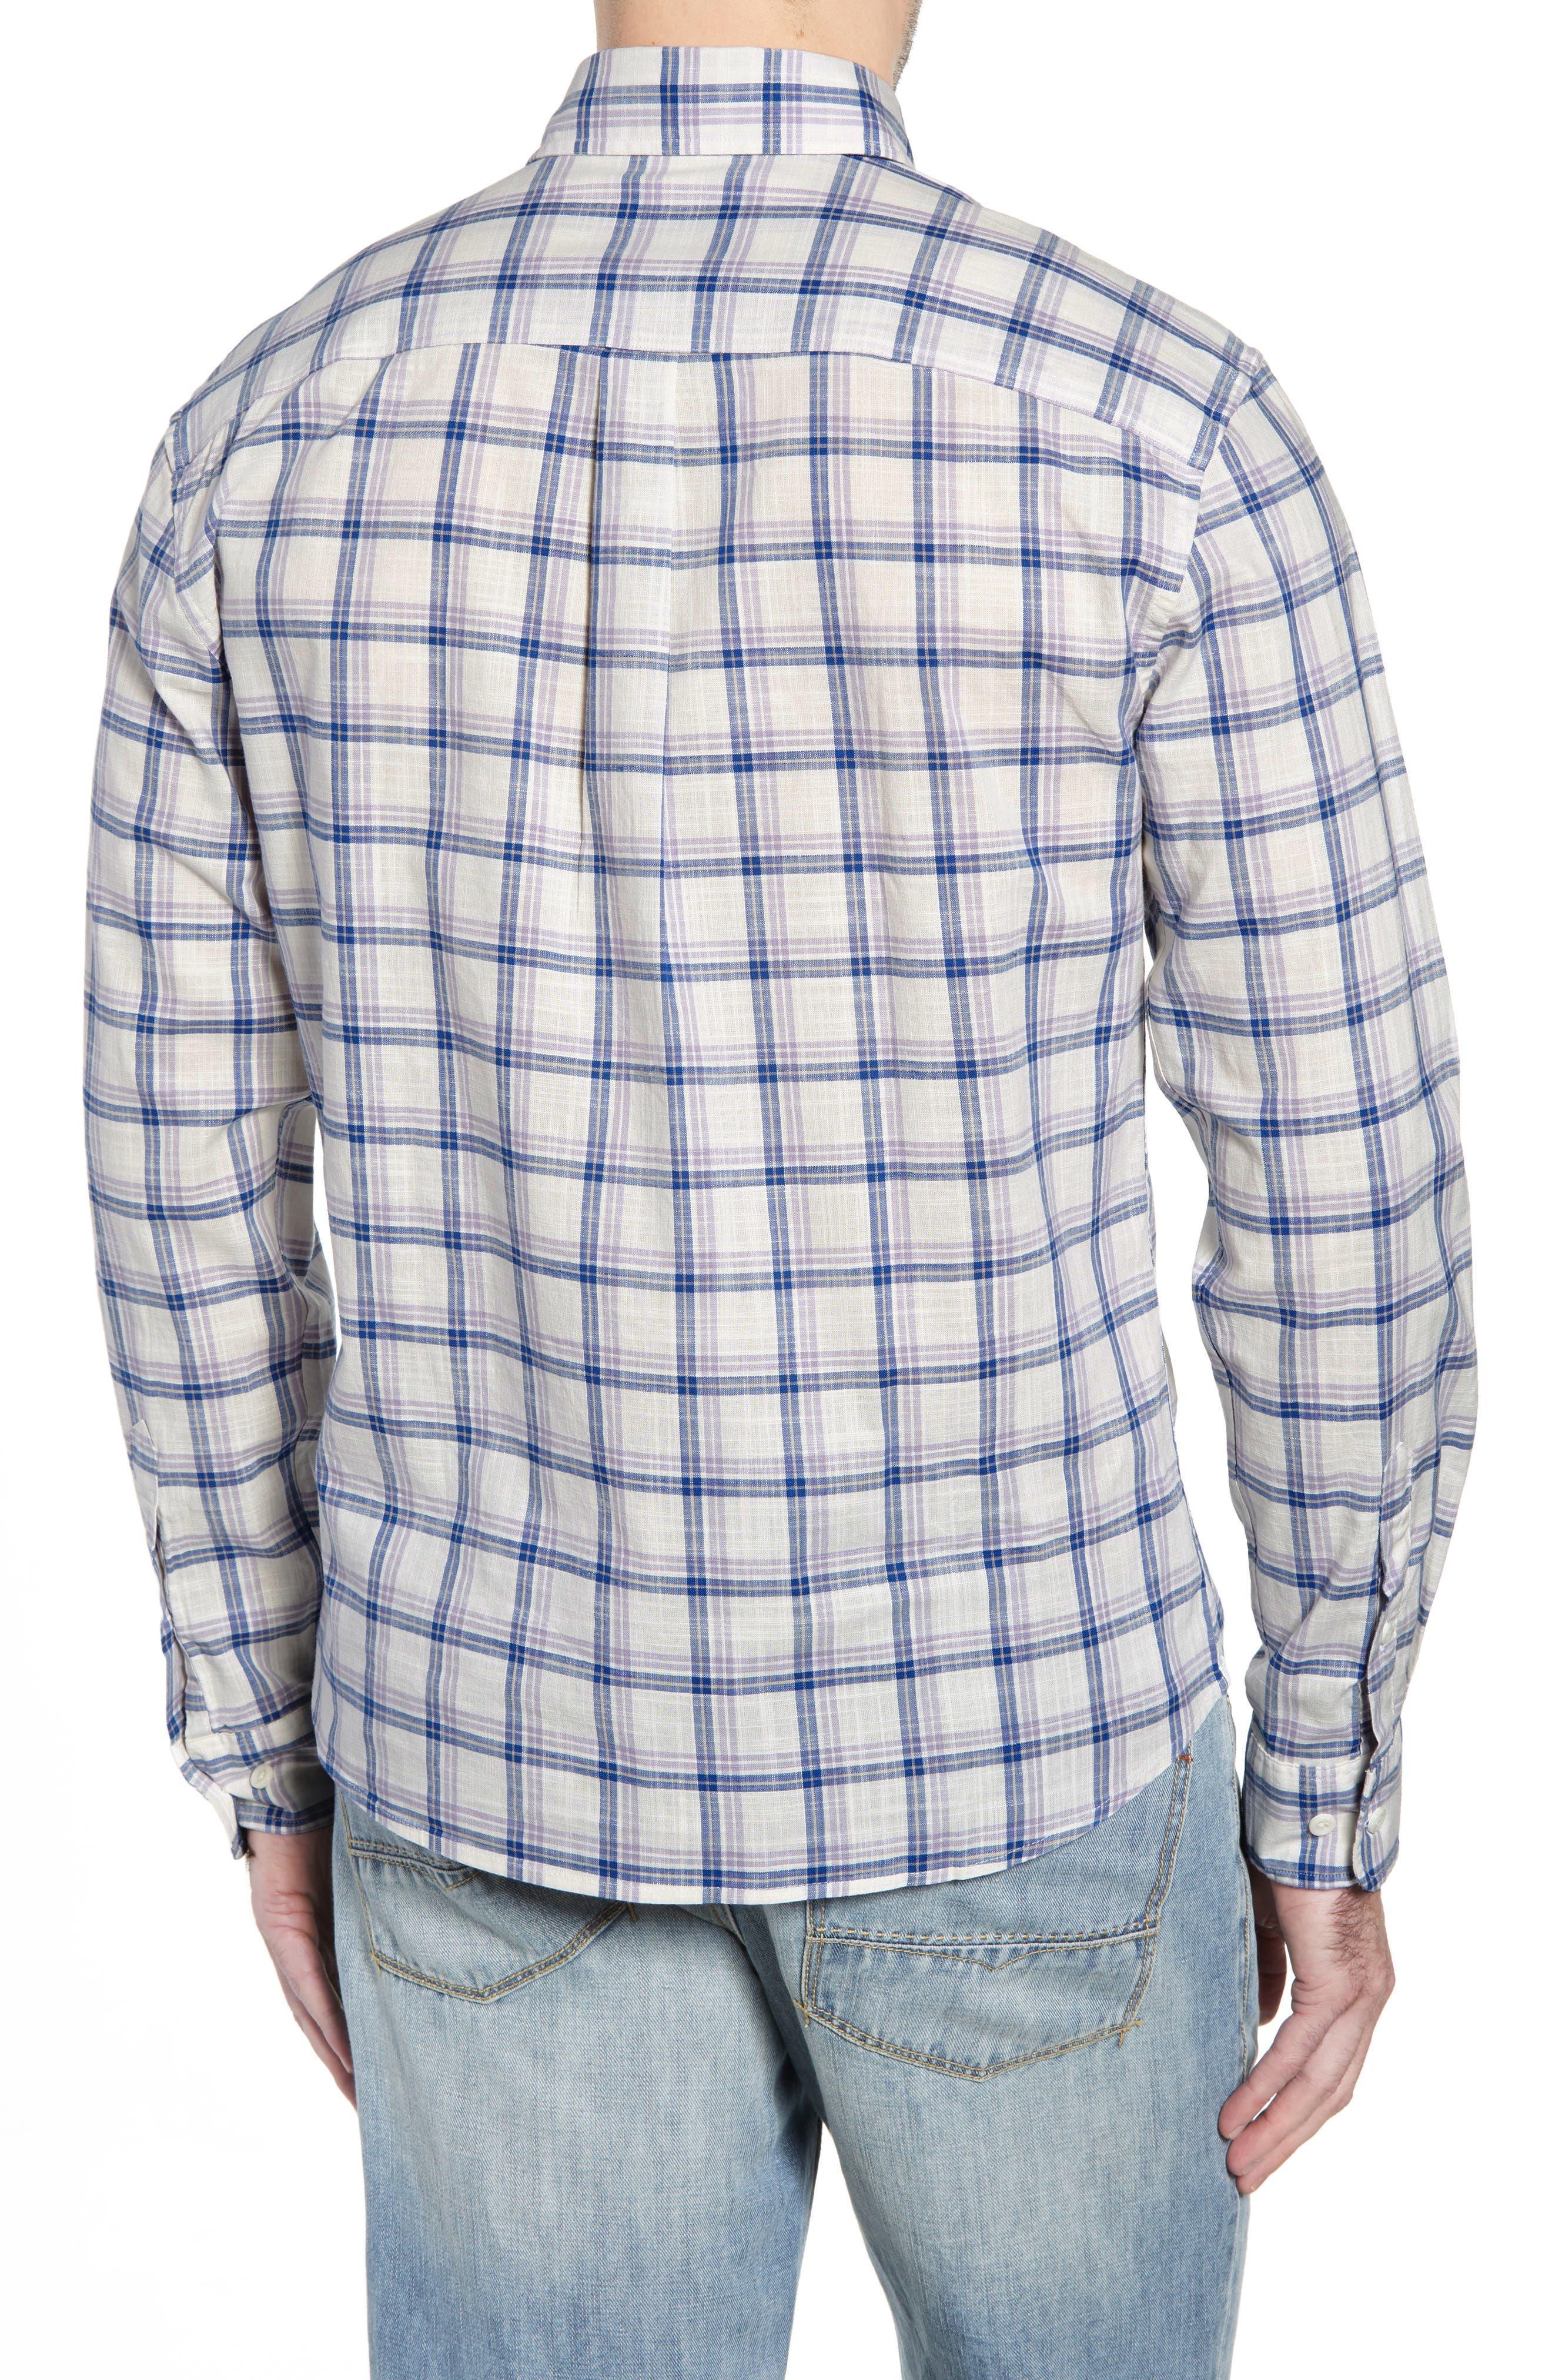 Davis Regular Fit Sport Shirt,                             Alternate thumbnail 3, color,                             LILAC